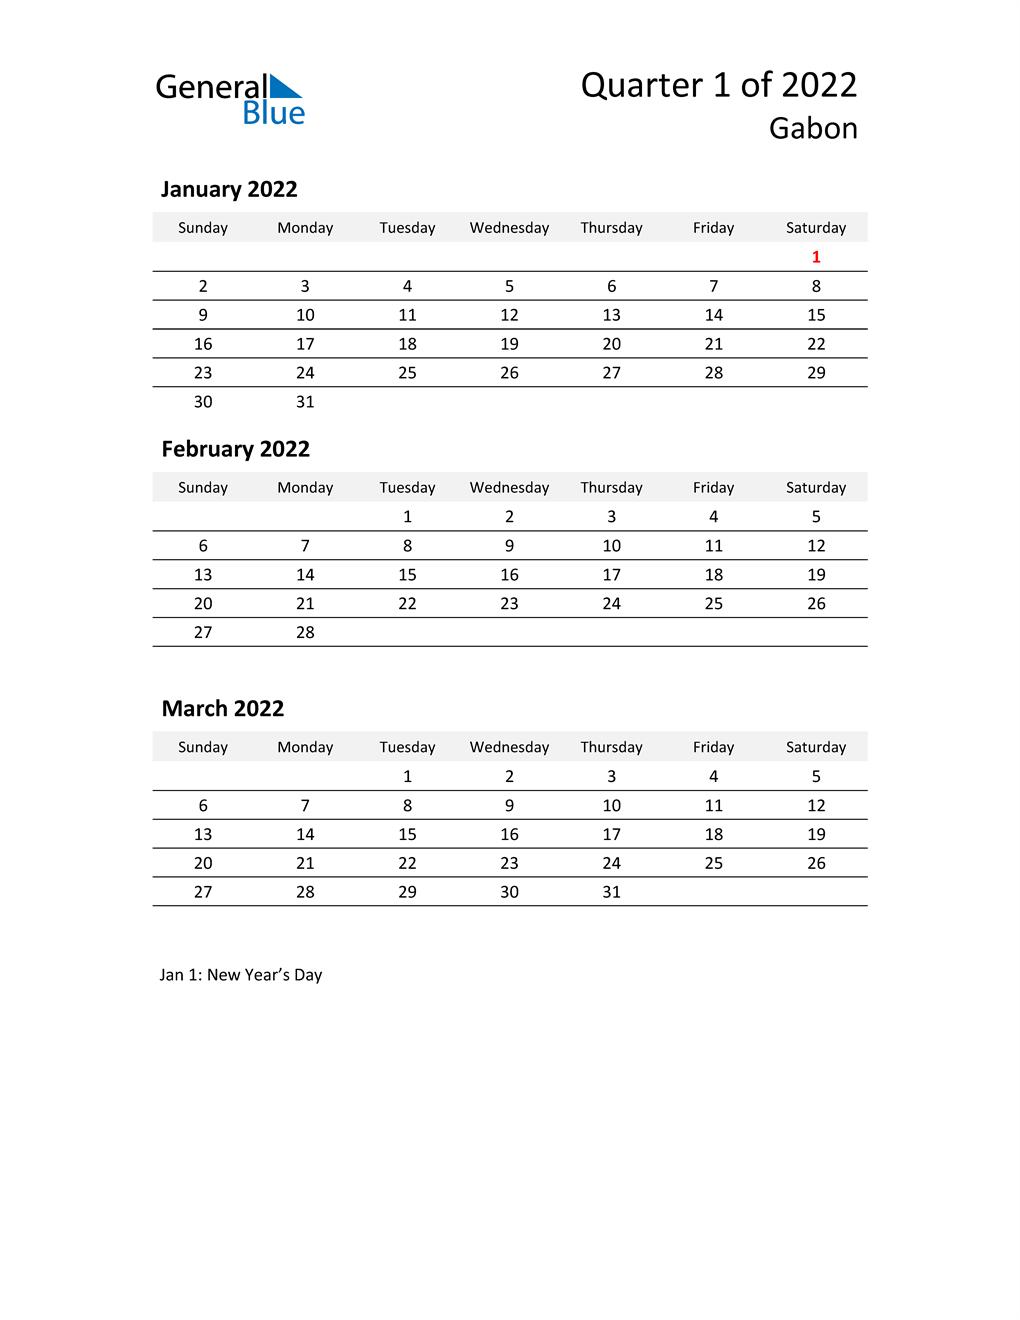 2022 Three-Month Calendar for Gabon